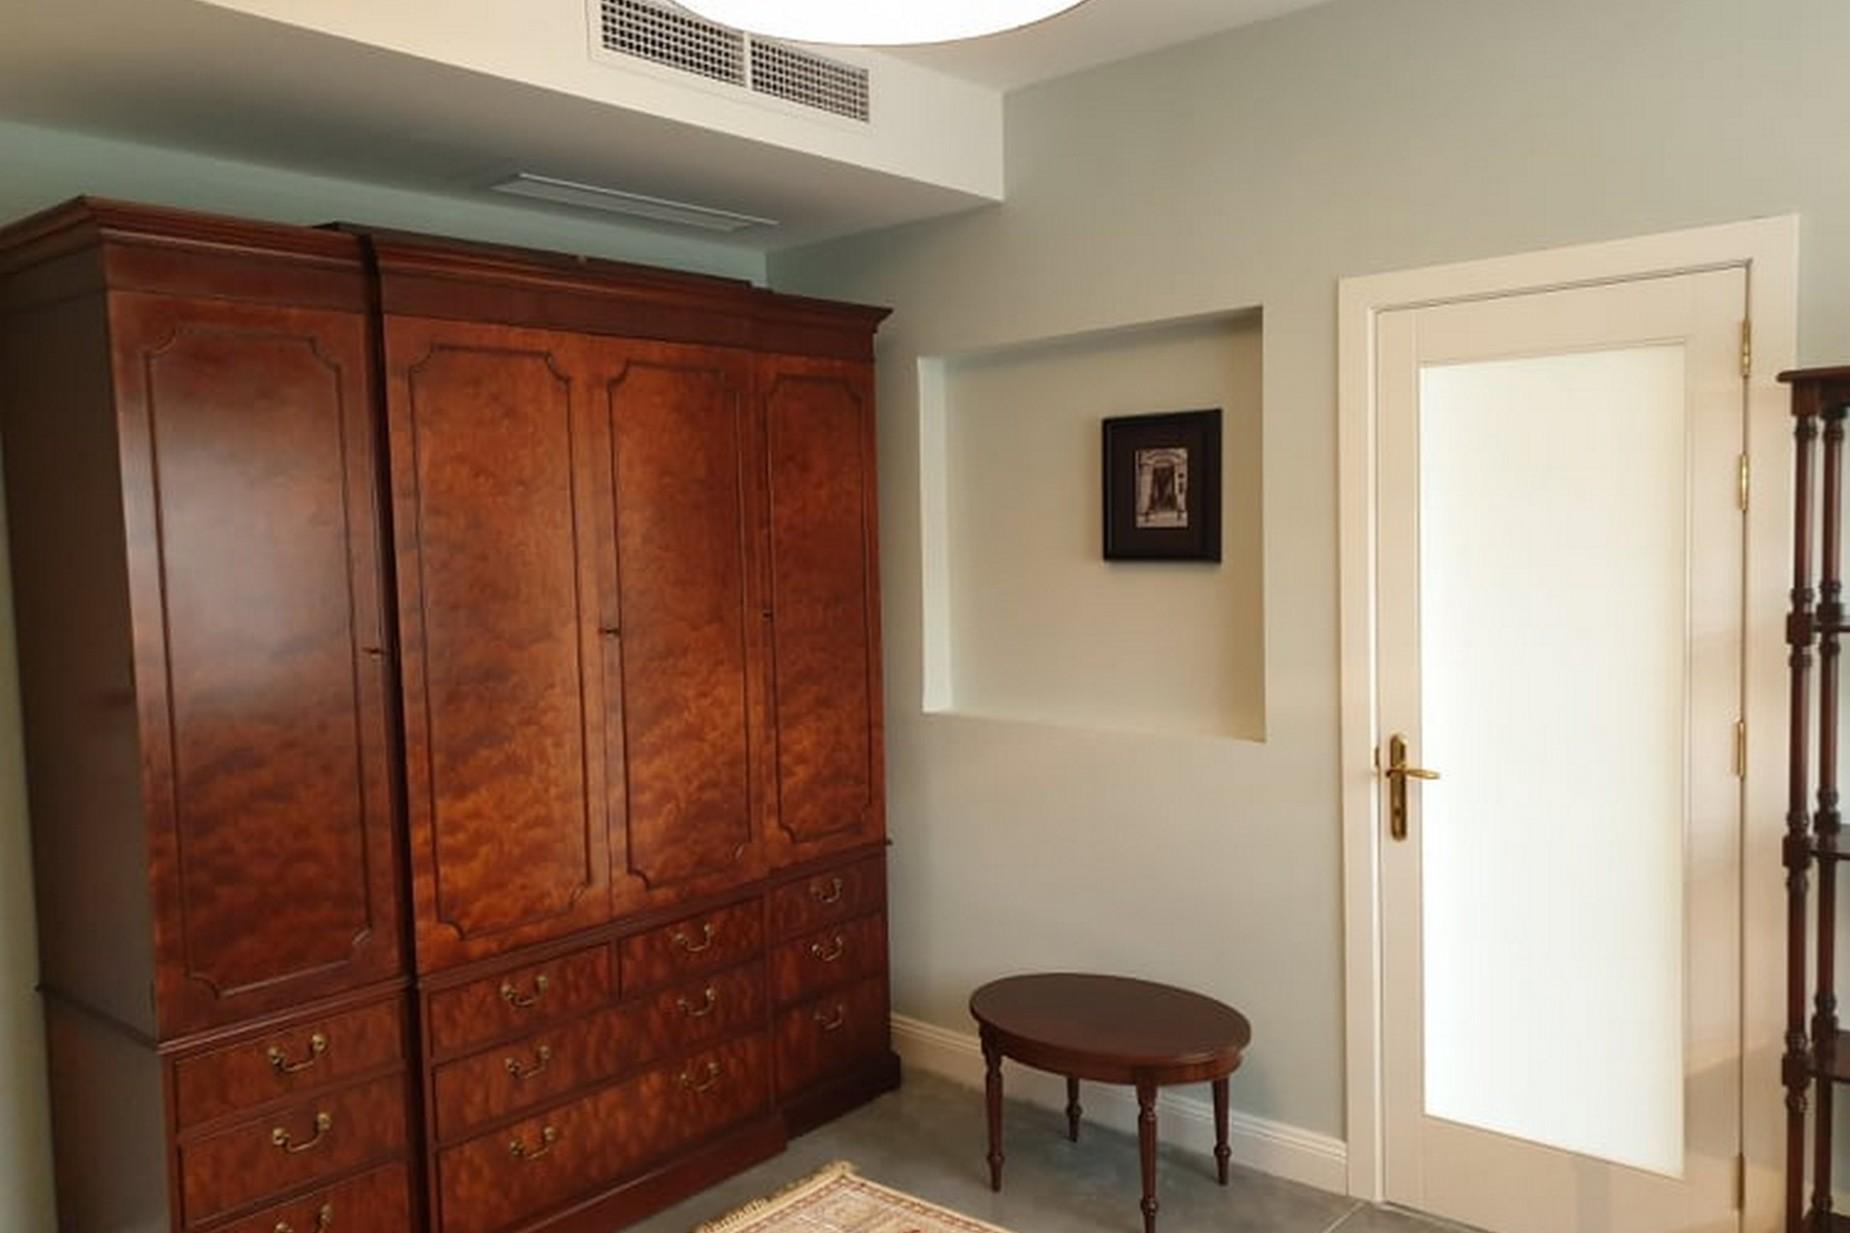 3 bed Apartment For Rent in Birkirkara, Birkirkara - thumb 21